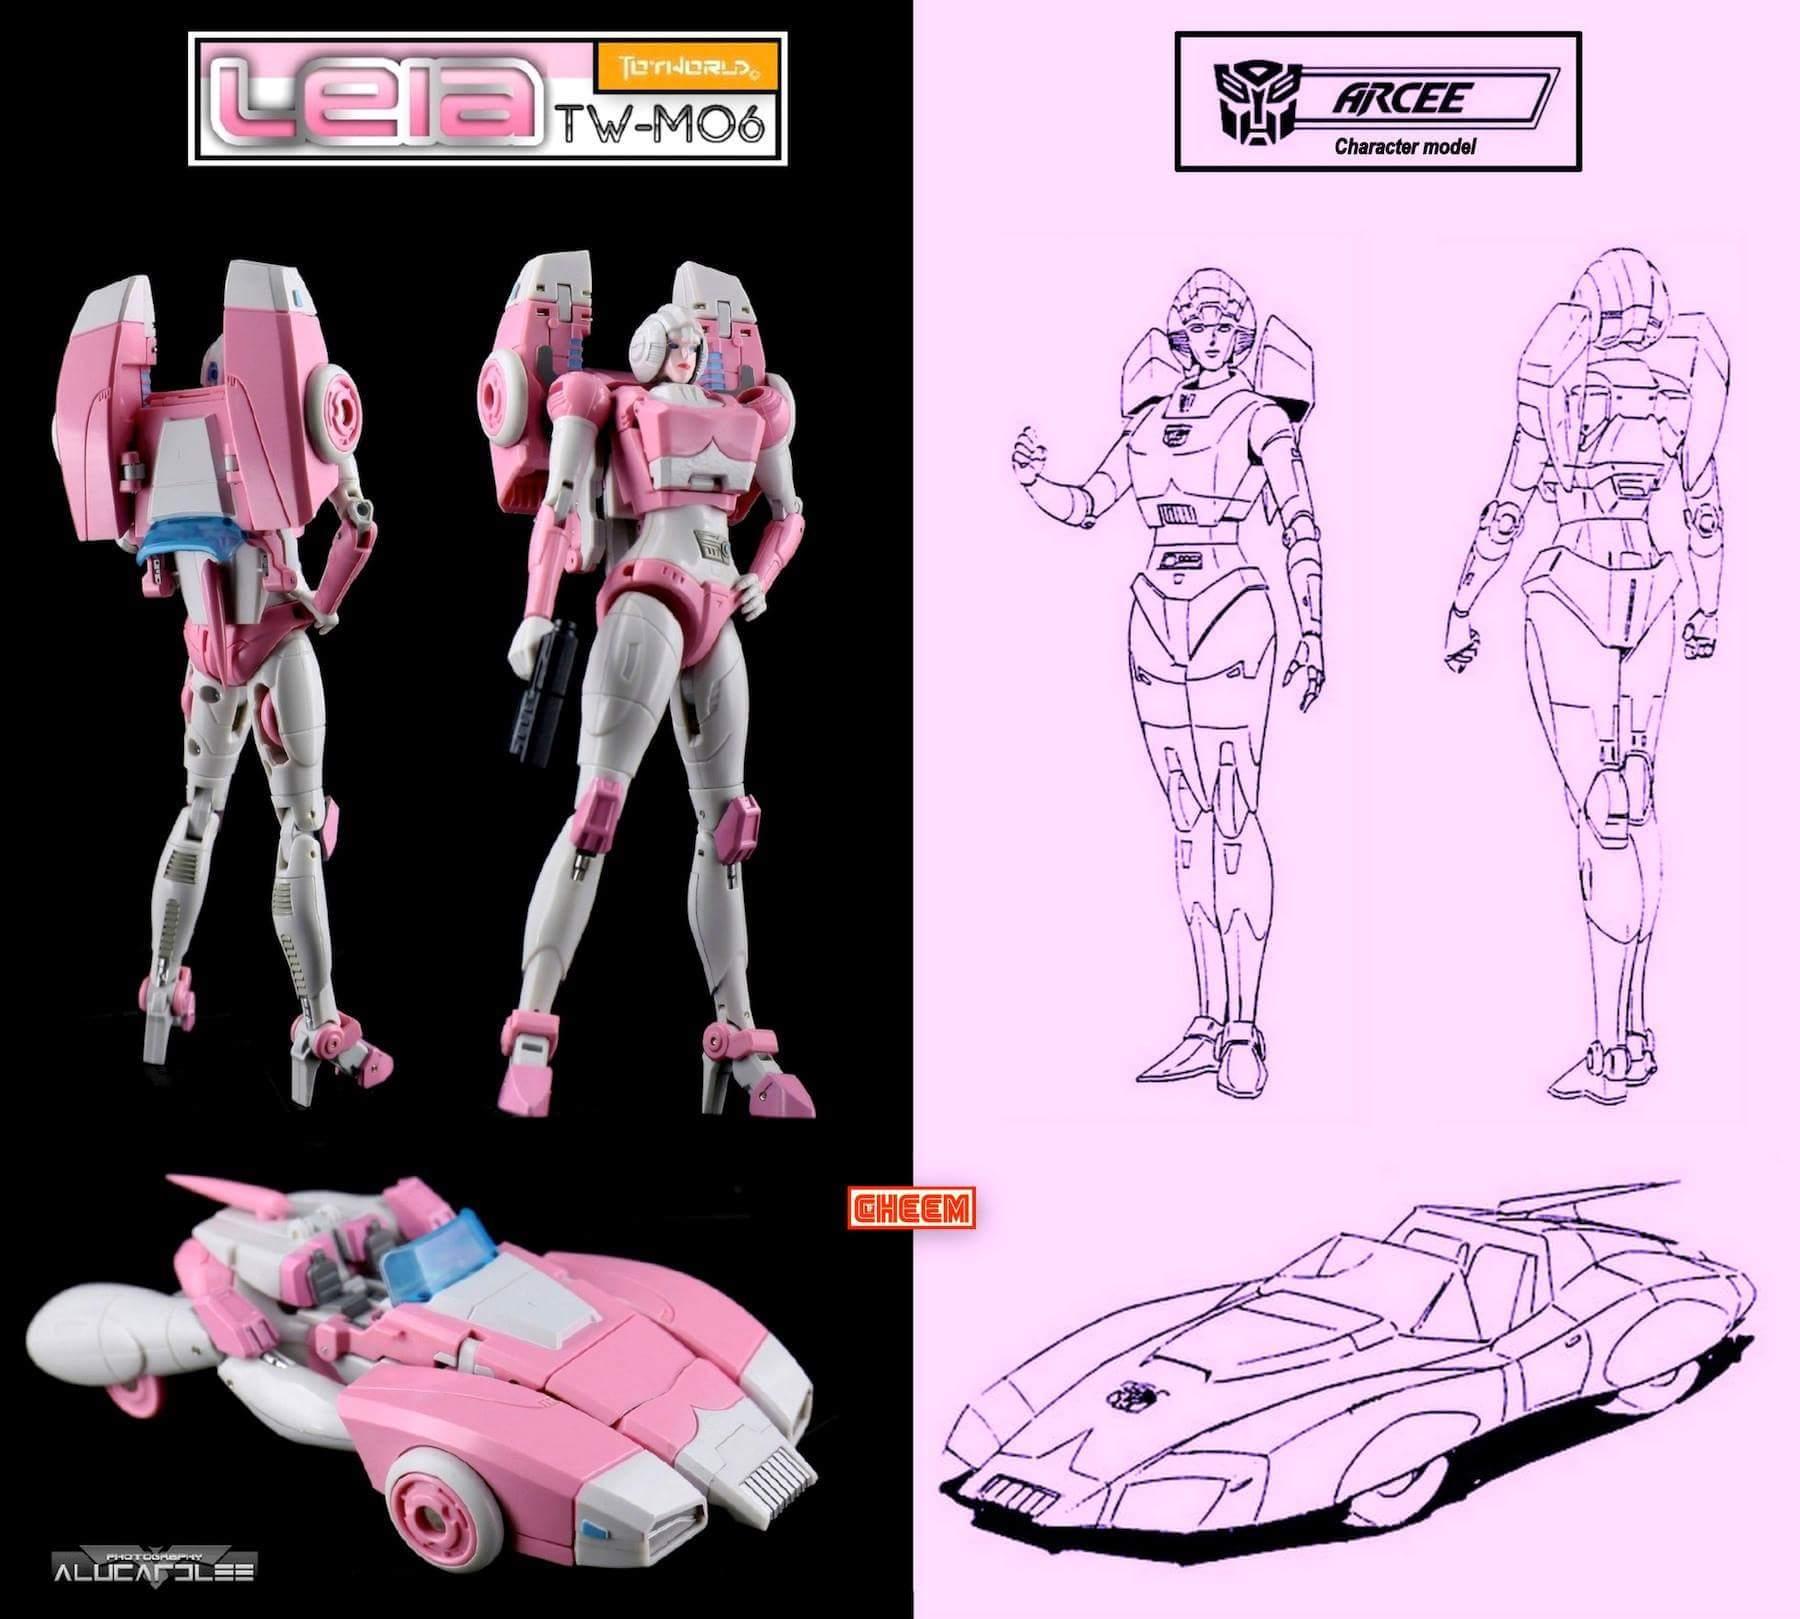 [Toyworld][Zeta Toys] Produit Tiers - Jouet TW-M06 Leia / Zeta-EX05 ArC aka Arcee/Arcie IzoG69QA